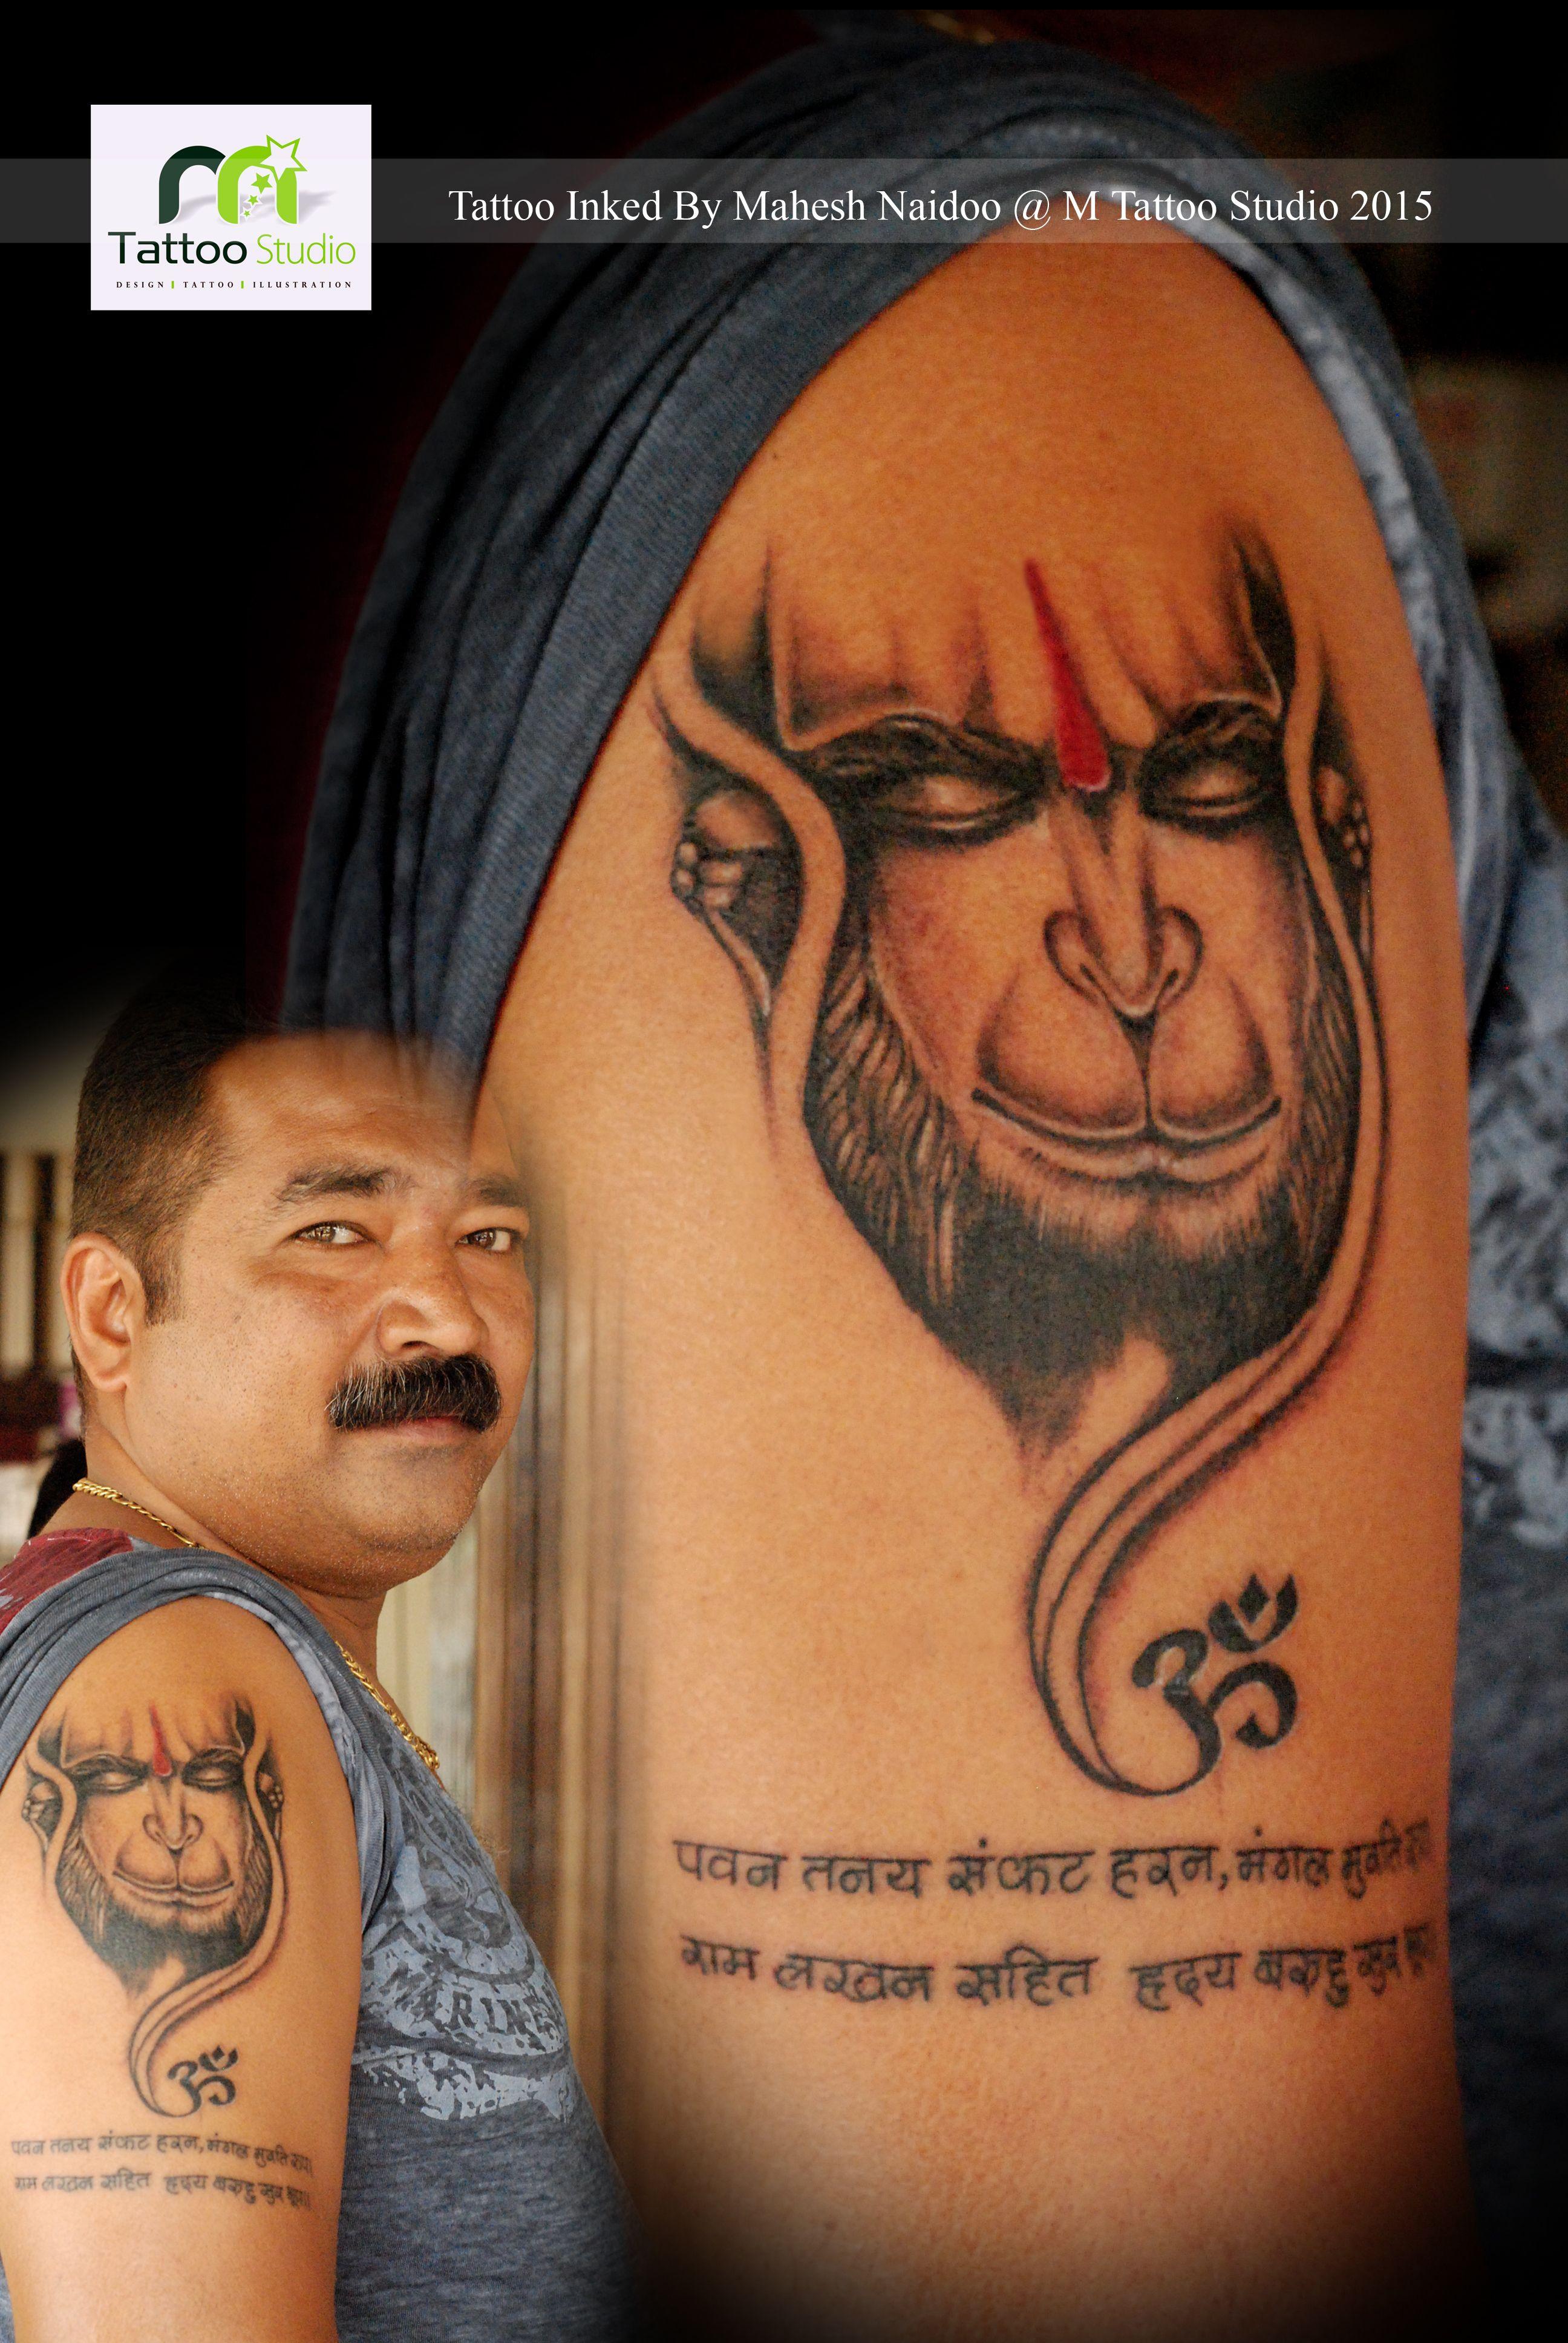 Lord Shiva Mahadev Designed Tattoo By Rahul Barve Skin Machine Tattoo Studio Bhopal Skinmachineta Shiva Tattoo Design Name Tattoo Designs Tattoo Designs